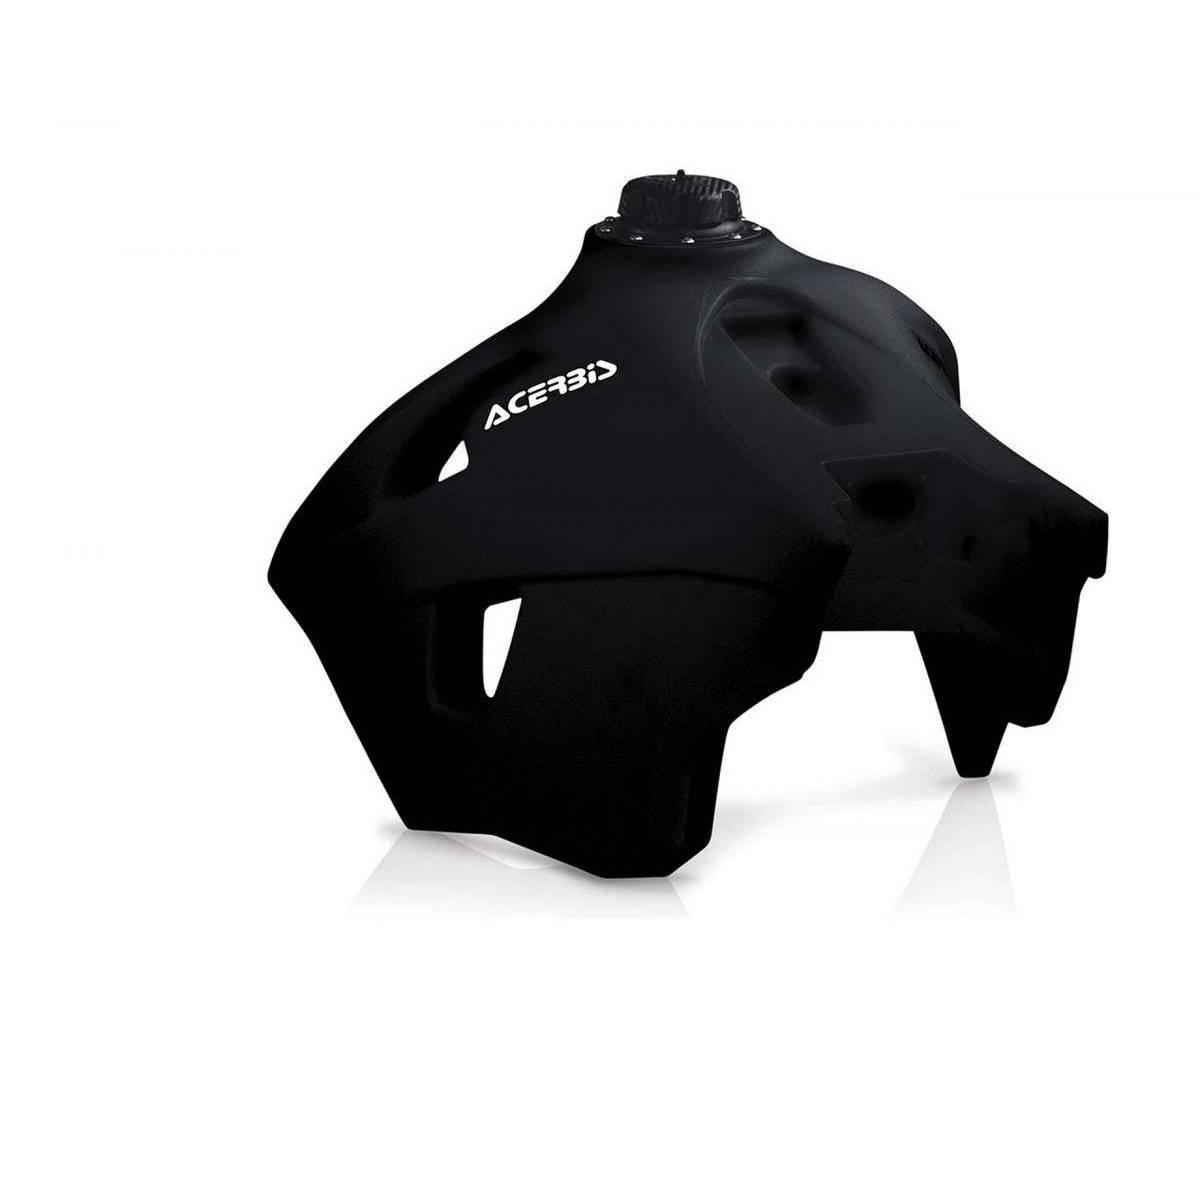 Depósito Acerbis KTM EXC-F 250/350/450/500 12/16 SX-F 350/450/505 13-15 15Litros NEGRO